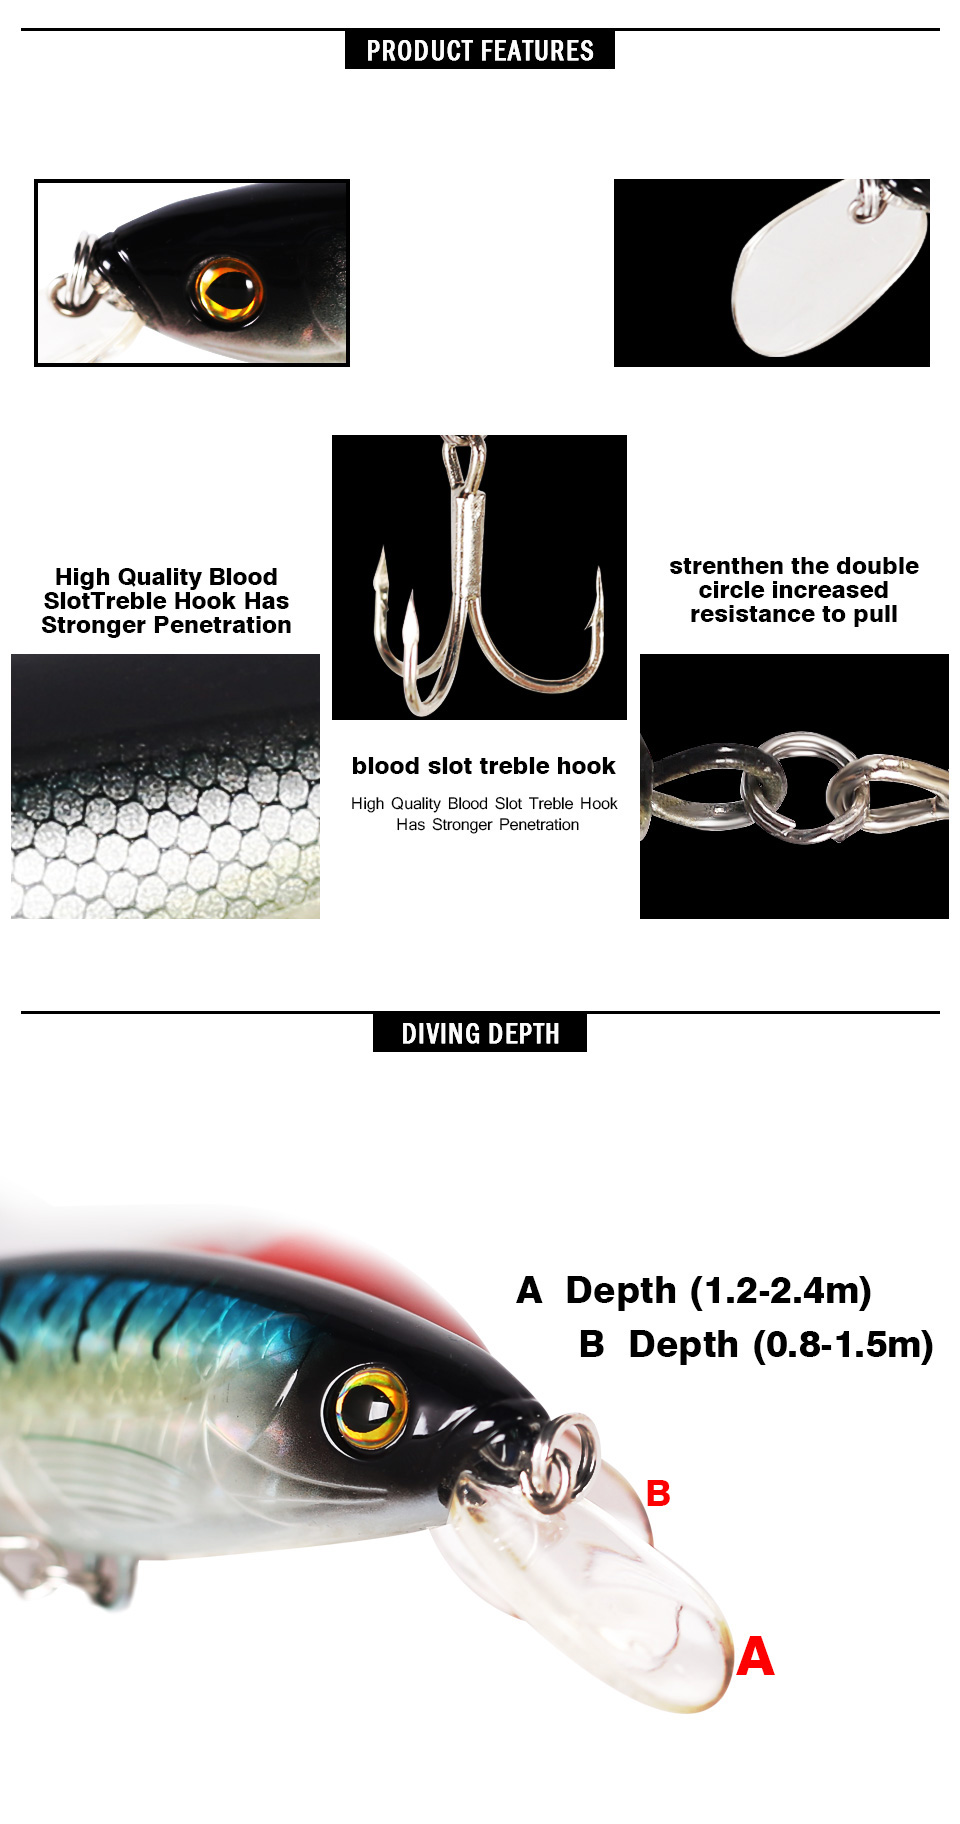 Kingdom Sea Fishing Lures Minnow 14cm 40g Quality Professional Hard stick baits fishing tackle artificial lure model 5382 (3)